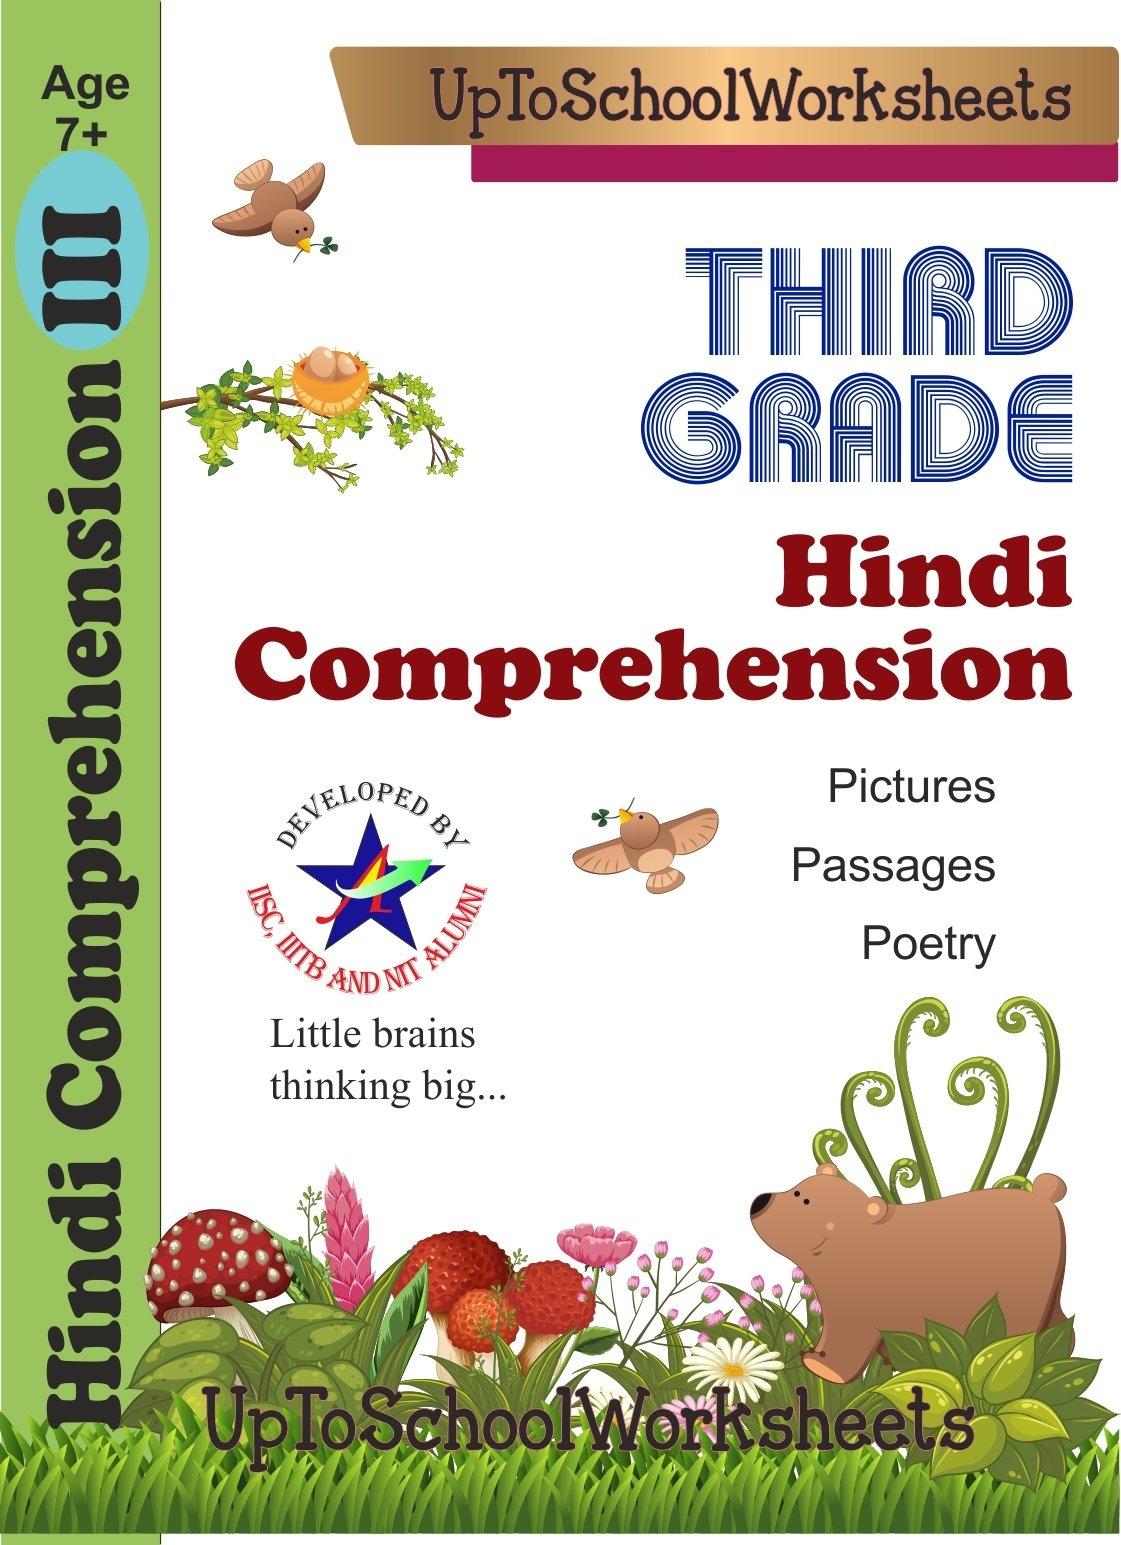 Worksheet: Addition Practice Worksheets Color Rub Adult Coloring - Free Printable Hindi Comprehension Worksheets For Grade 3